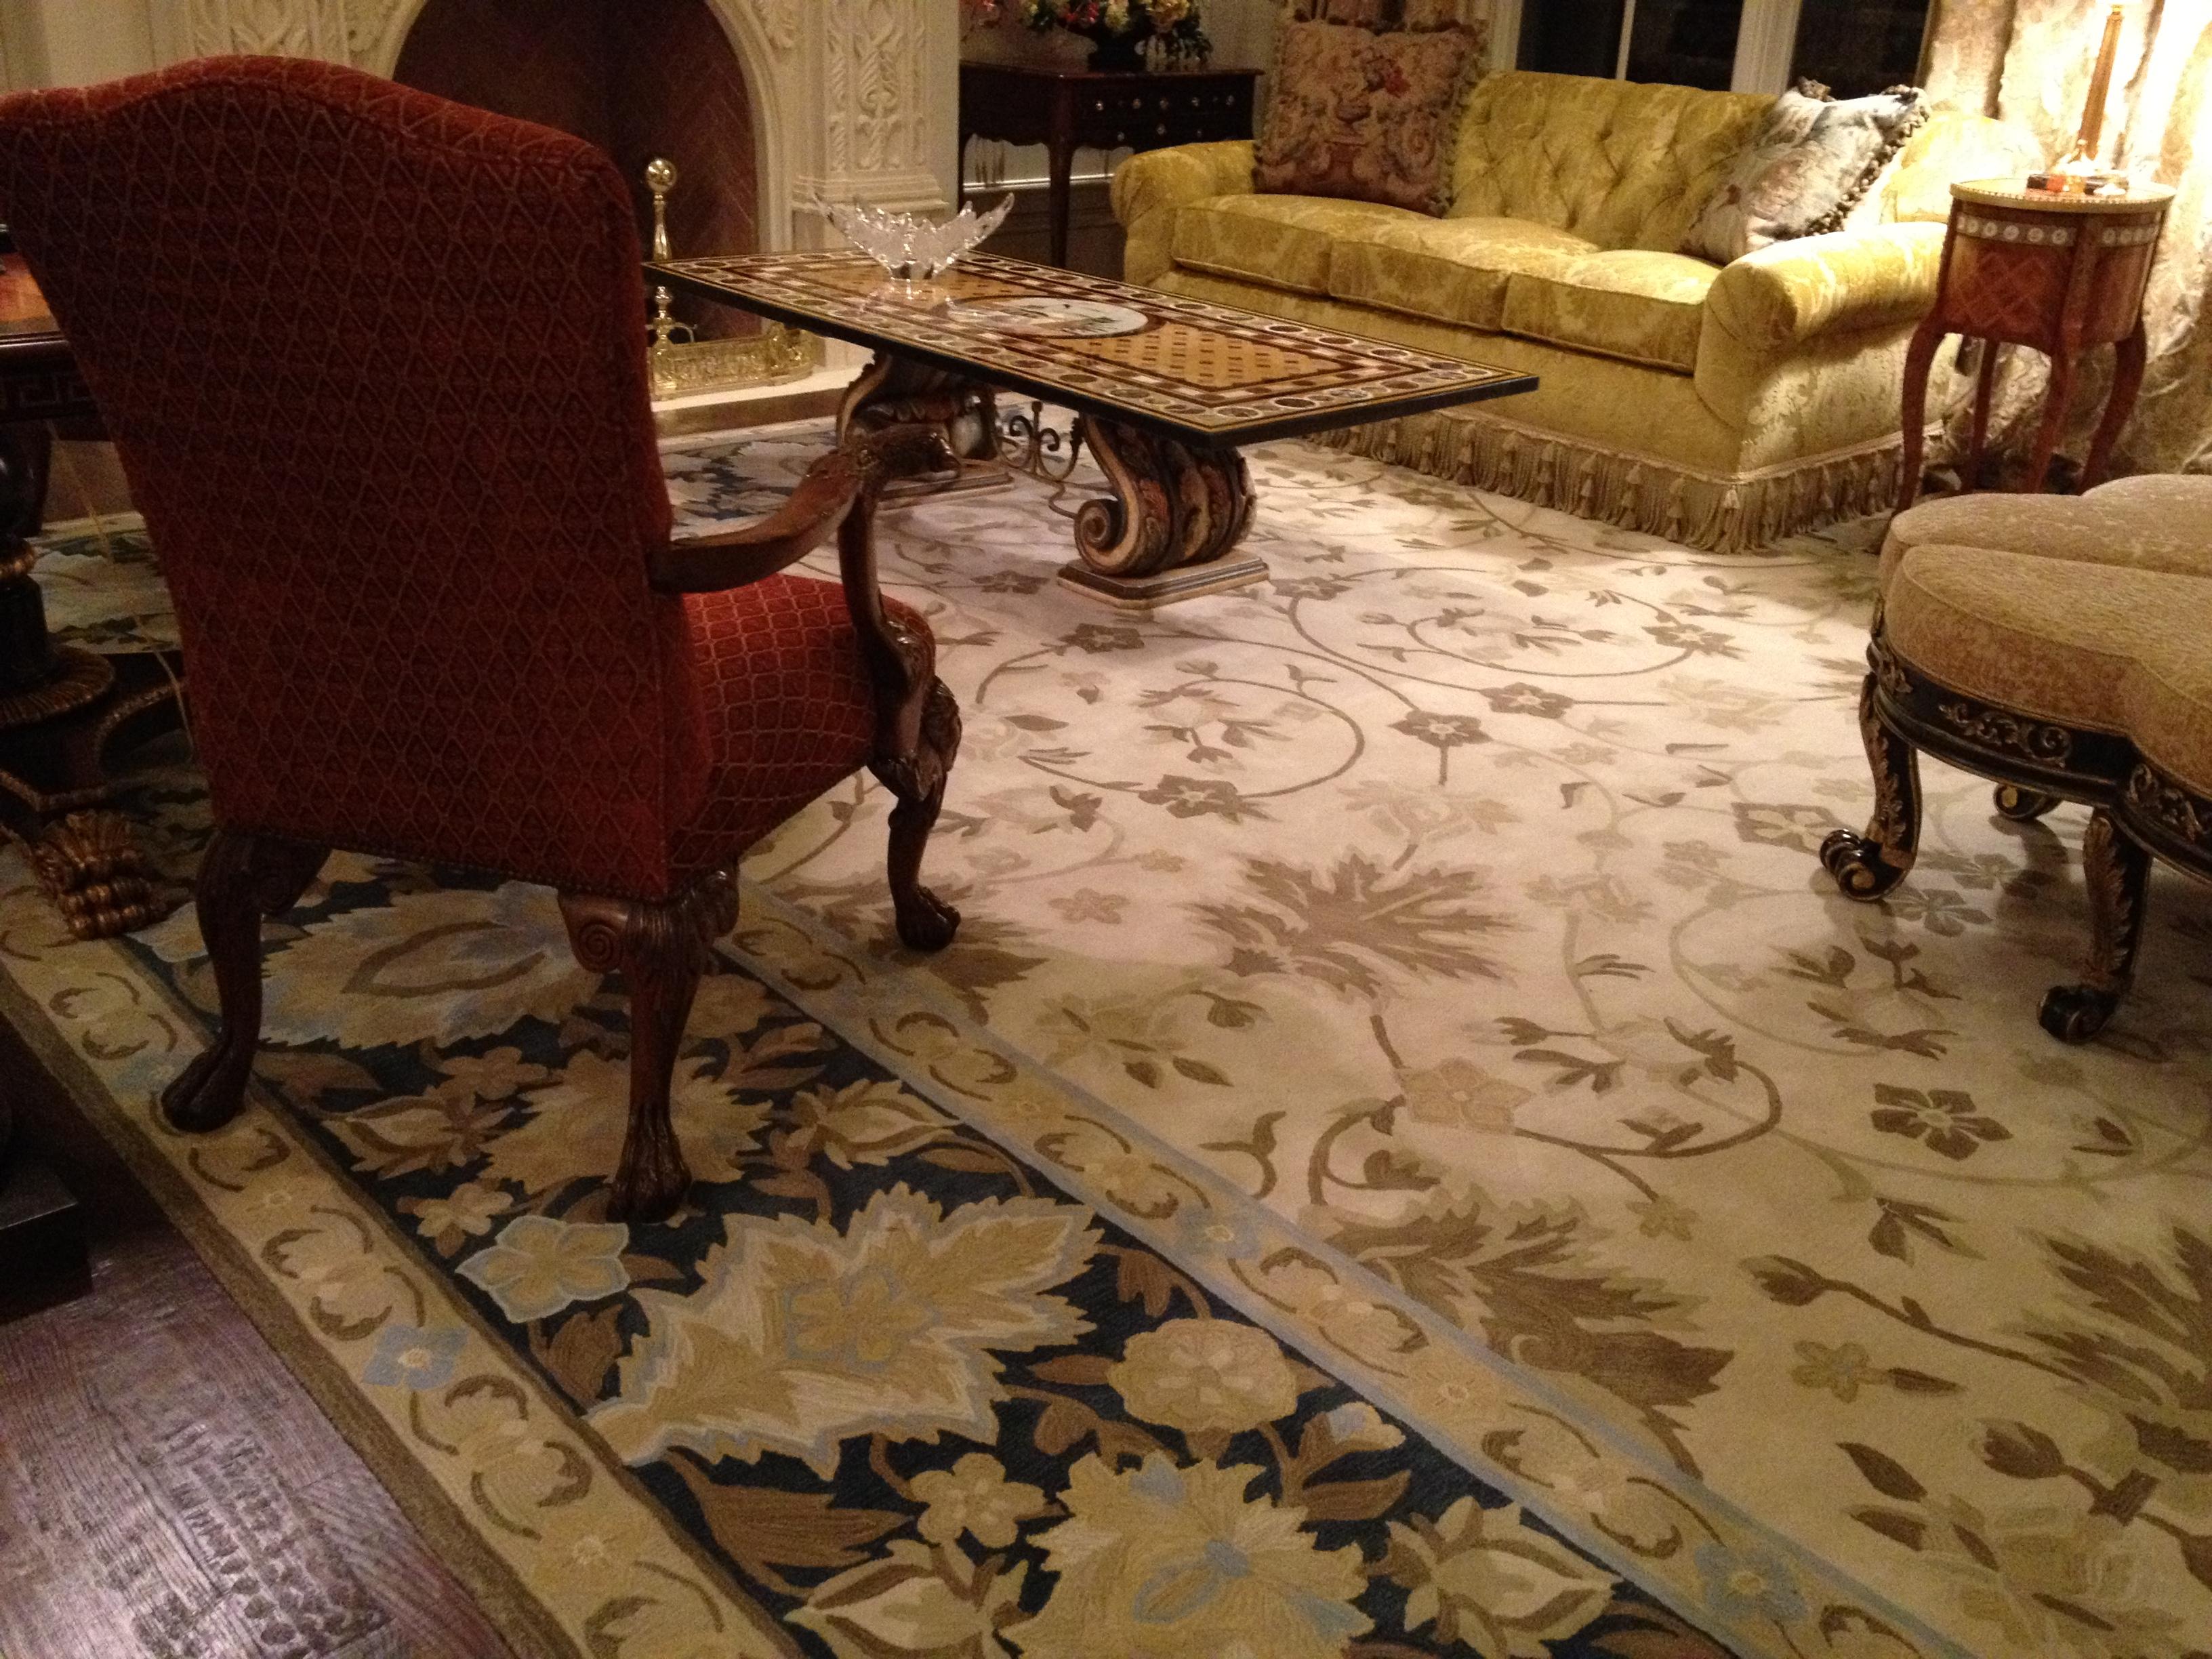 Handscraped Hardwoods under the Custom Carpet rug